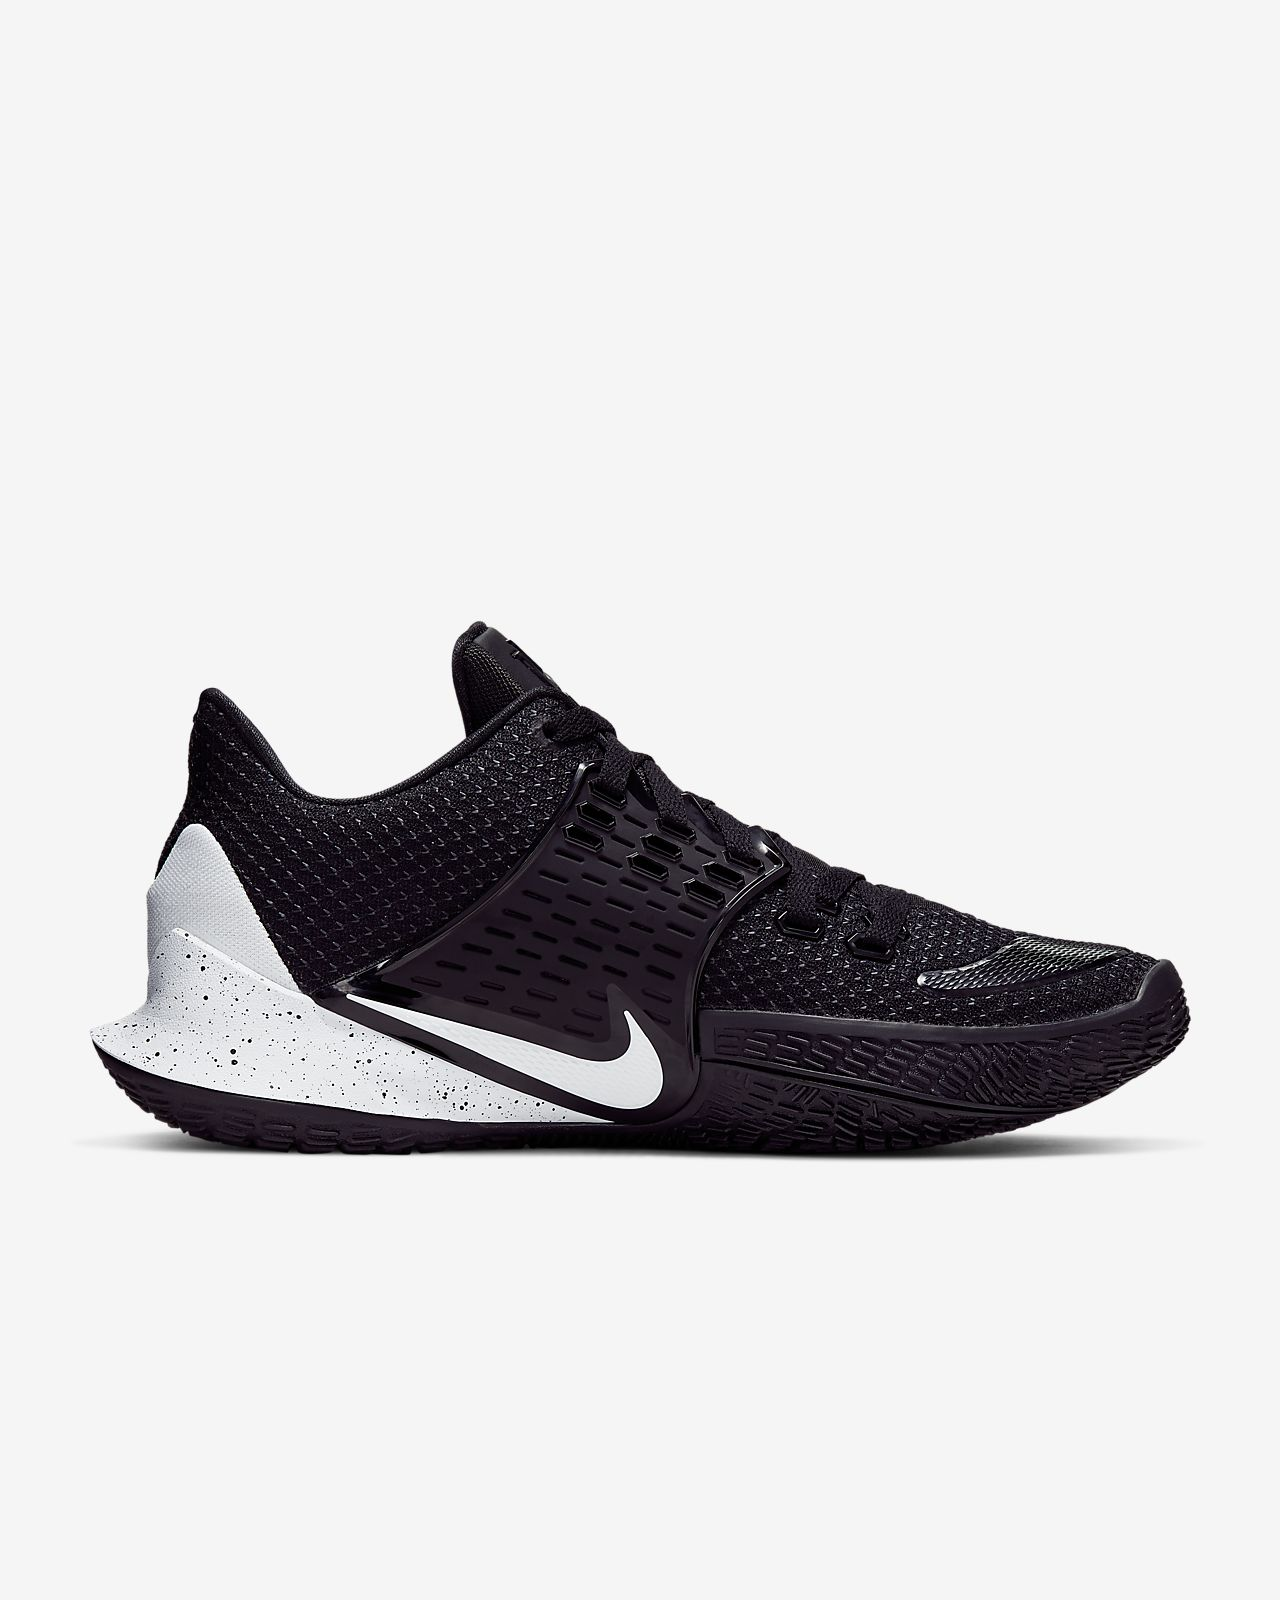 huge selection of 60268 edb07 Kyrie Low 2 Basketball Shoe